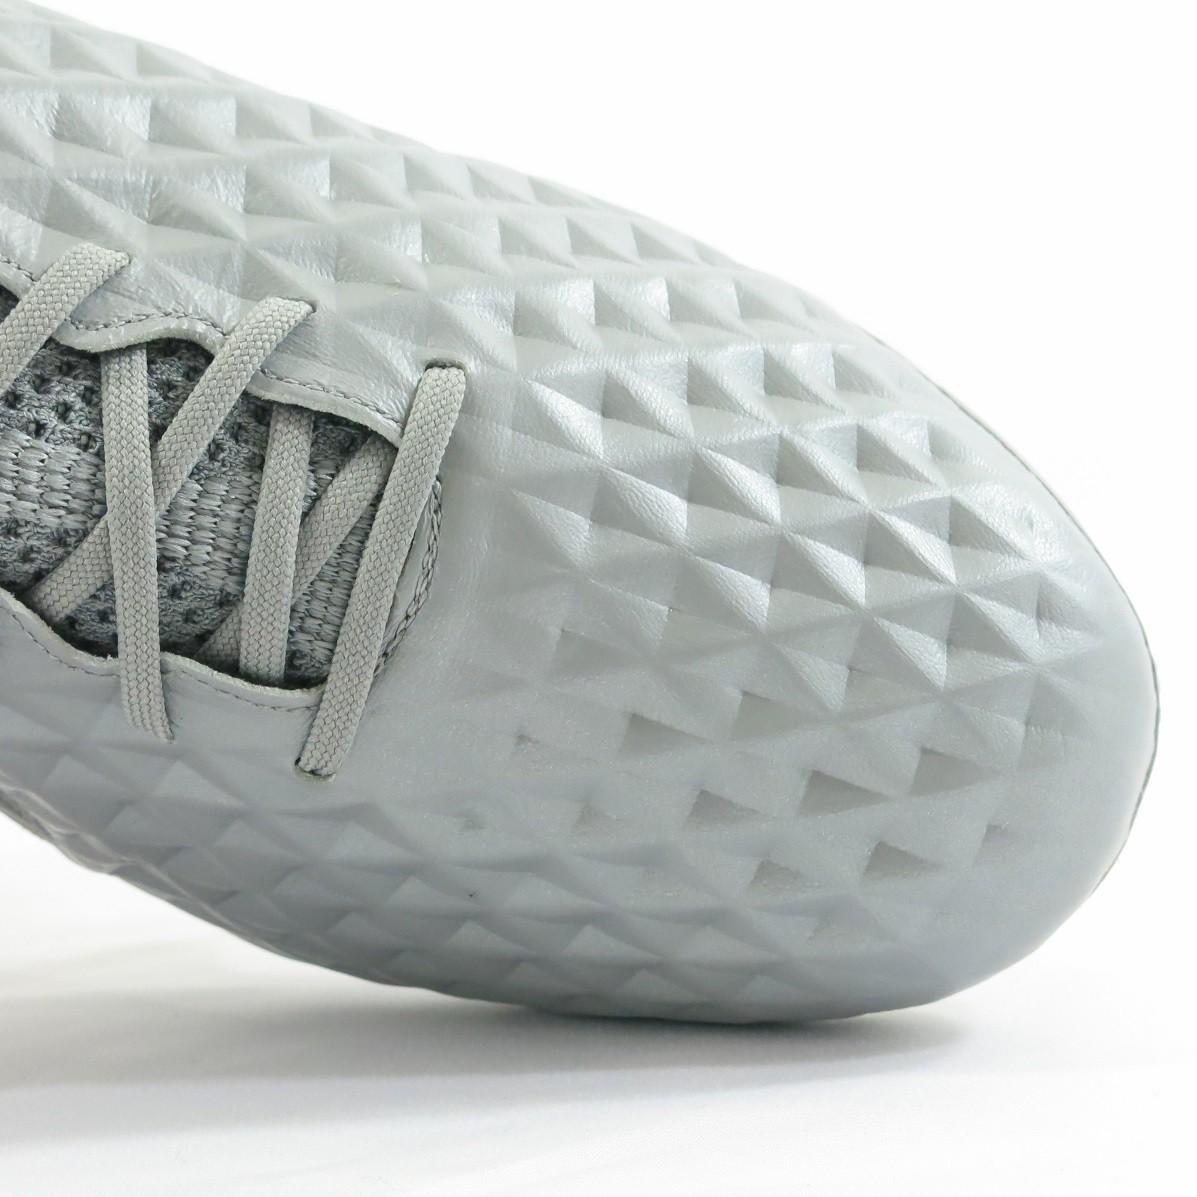 Chuteira Nike Tiempo Legend Elite FG - Couro de Canguru